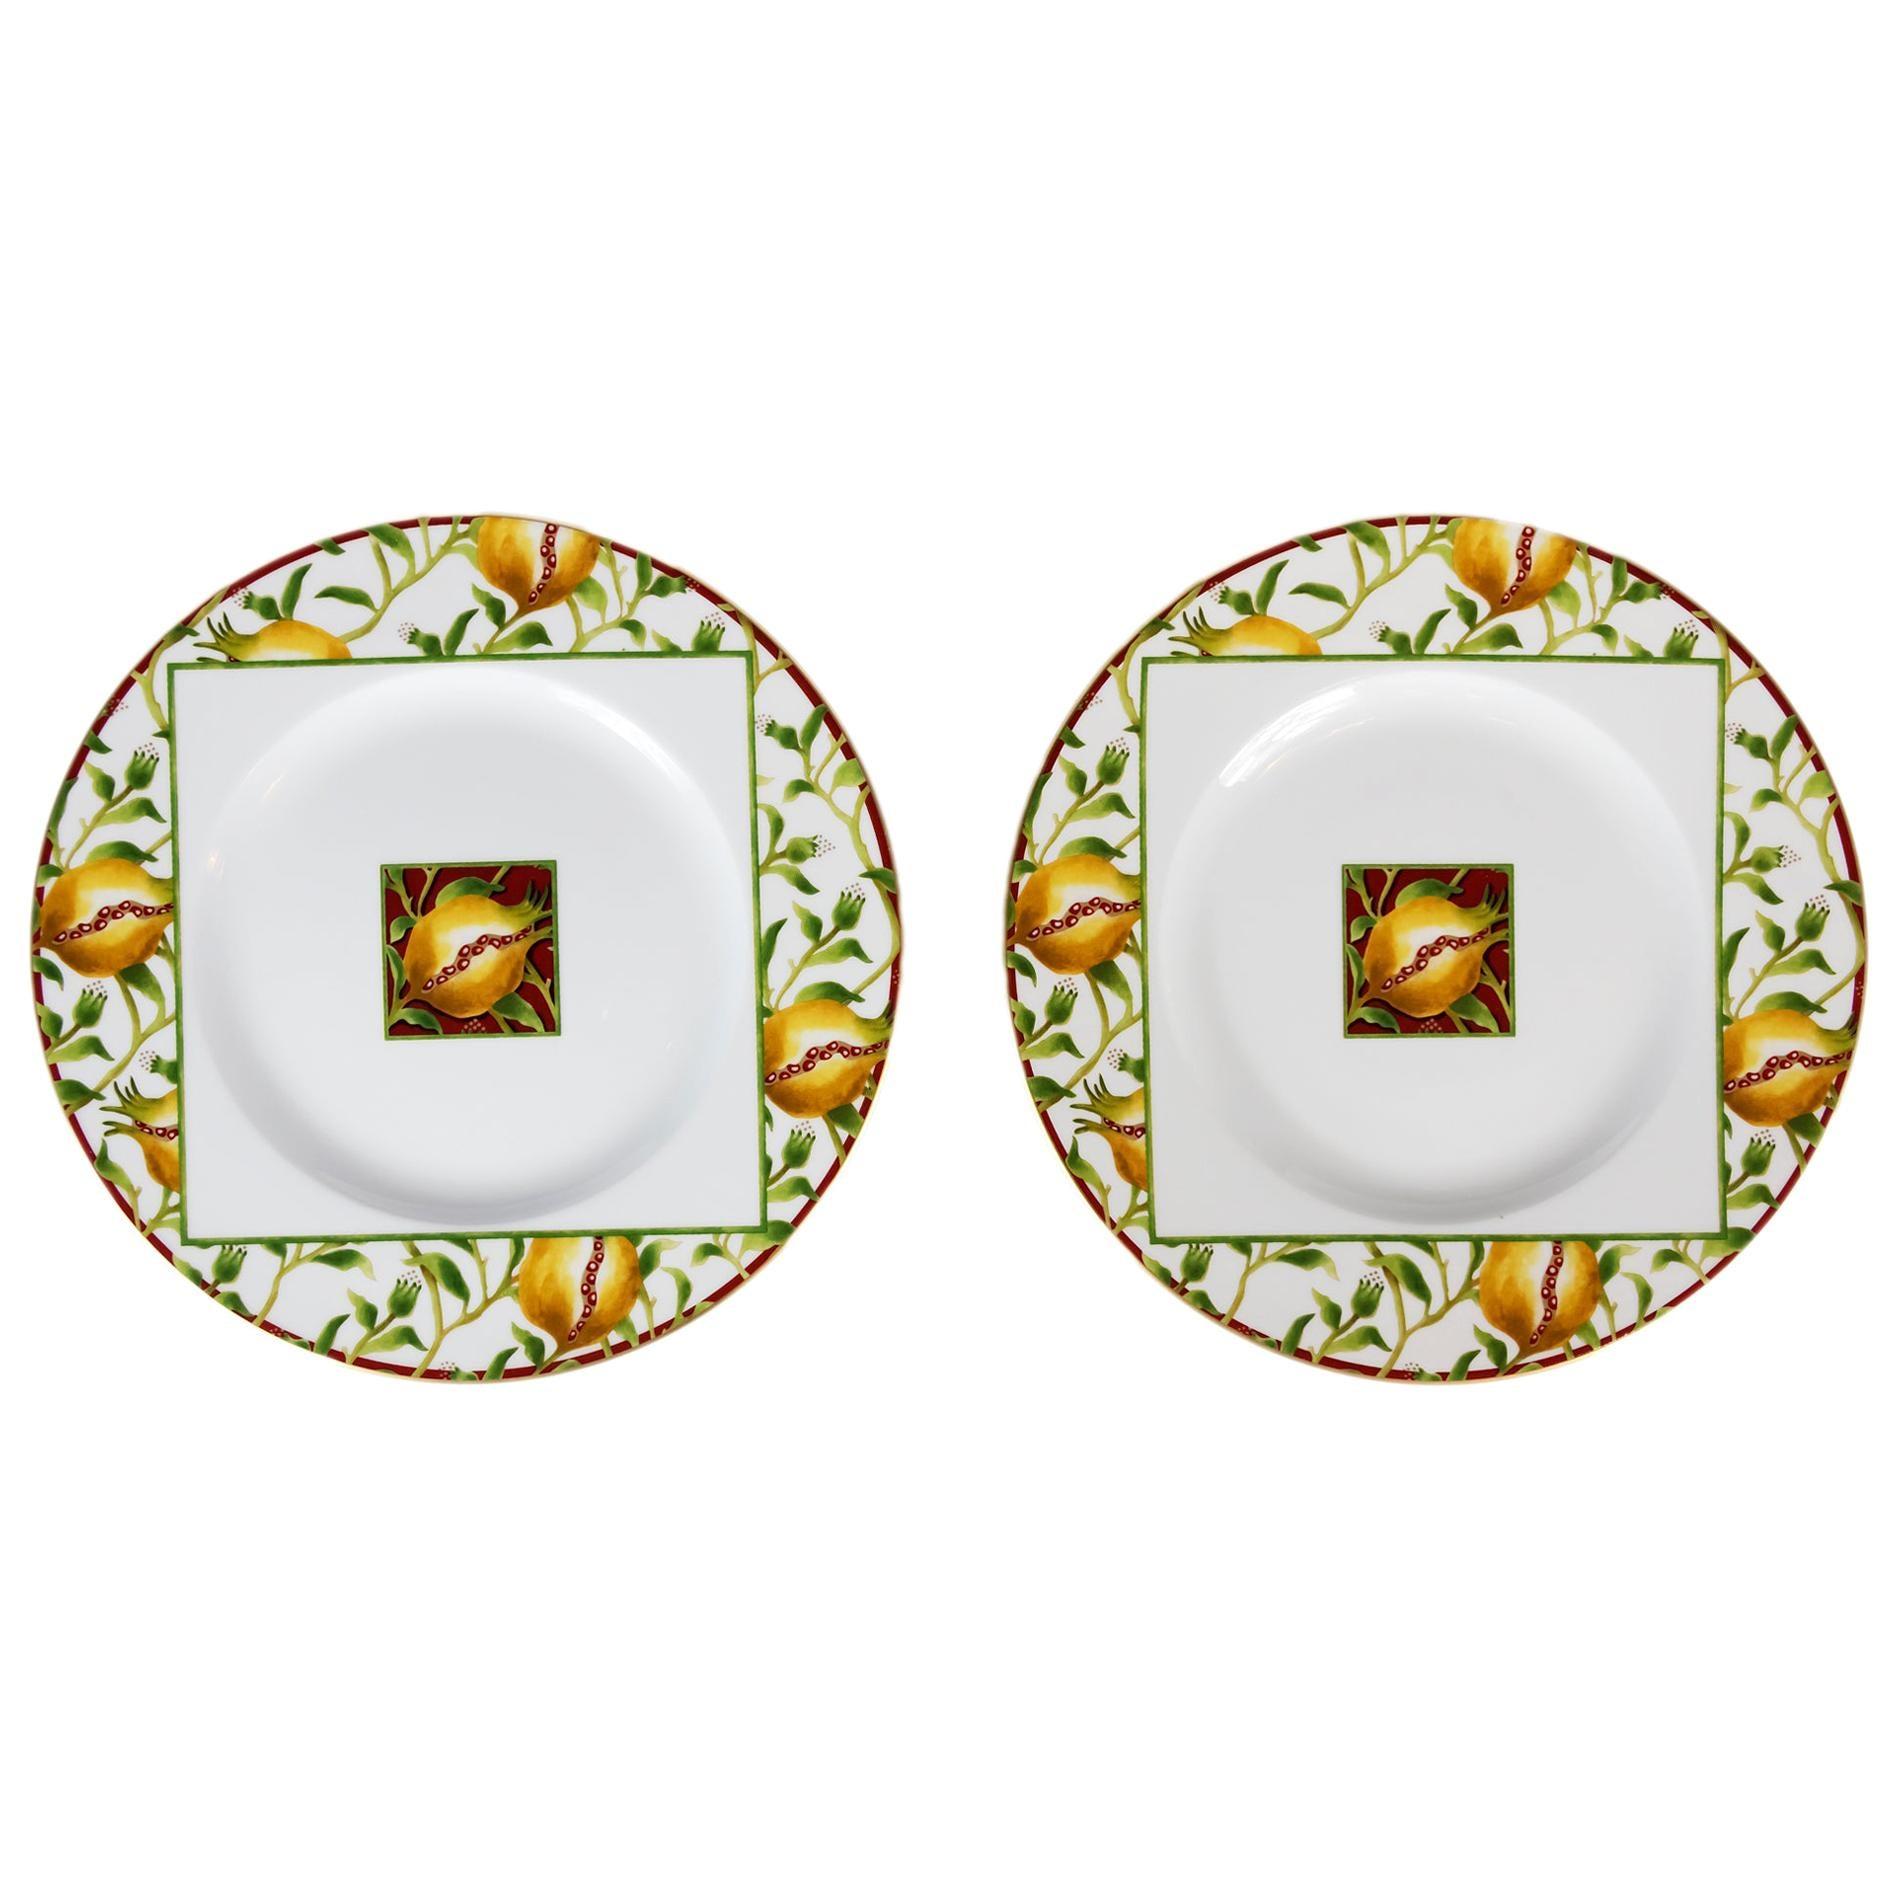 Pair of Italian Richard Ginori Porcelain Plates